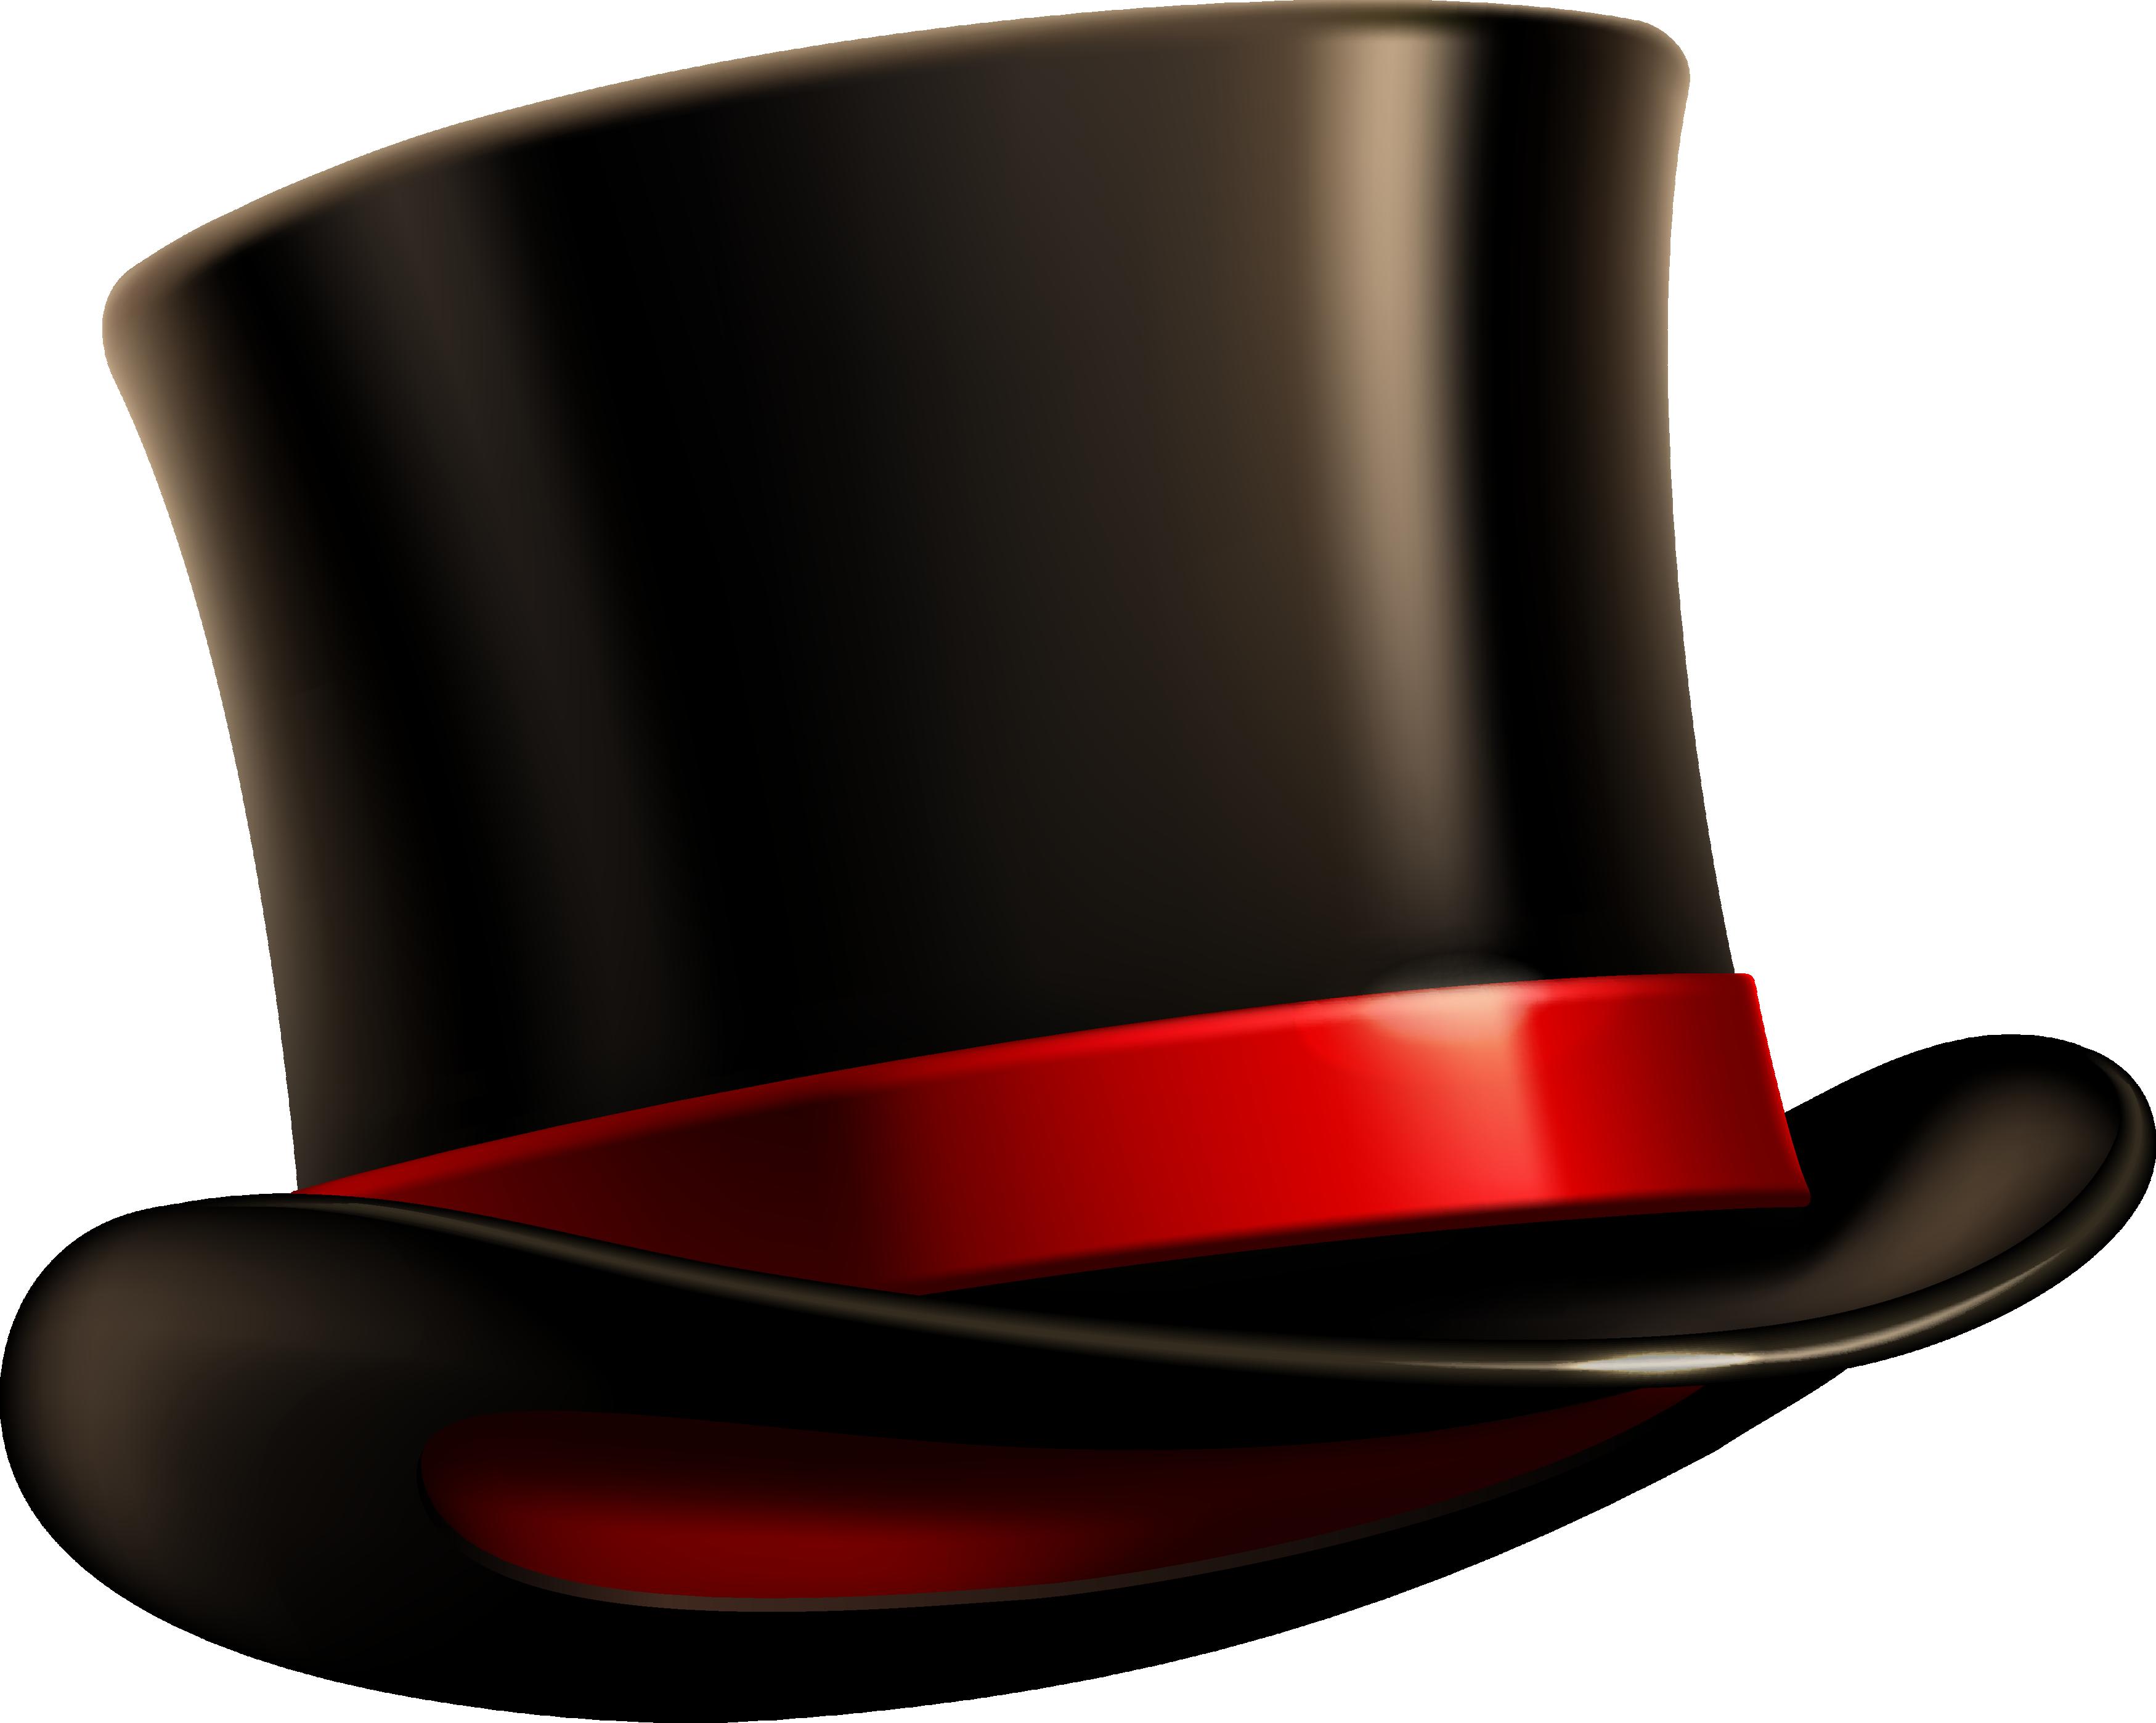 3499x2797 Hat Png Image